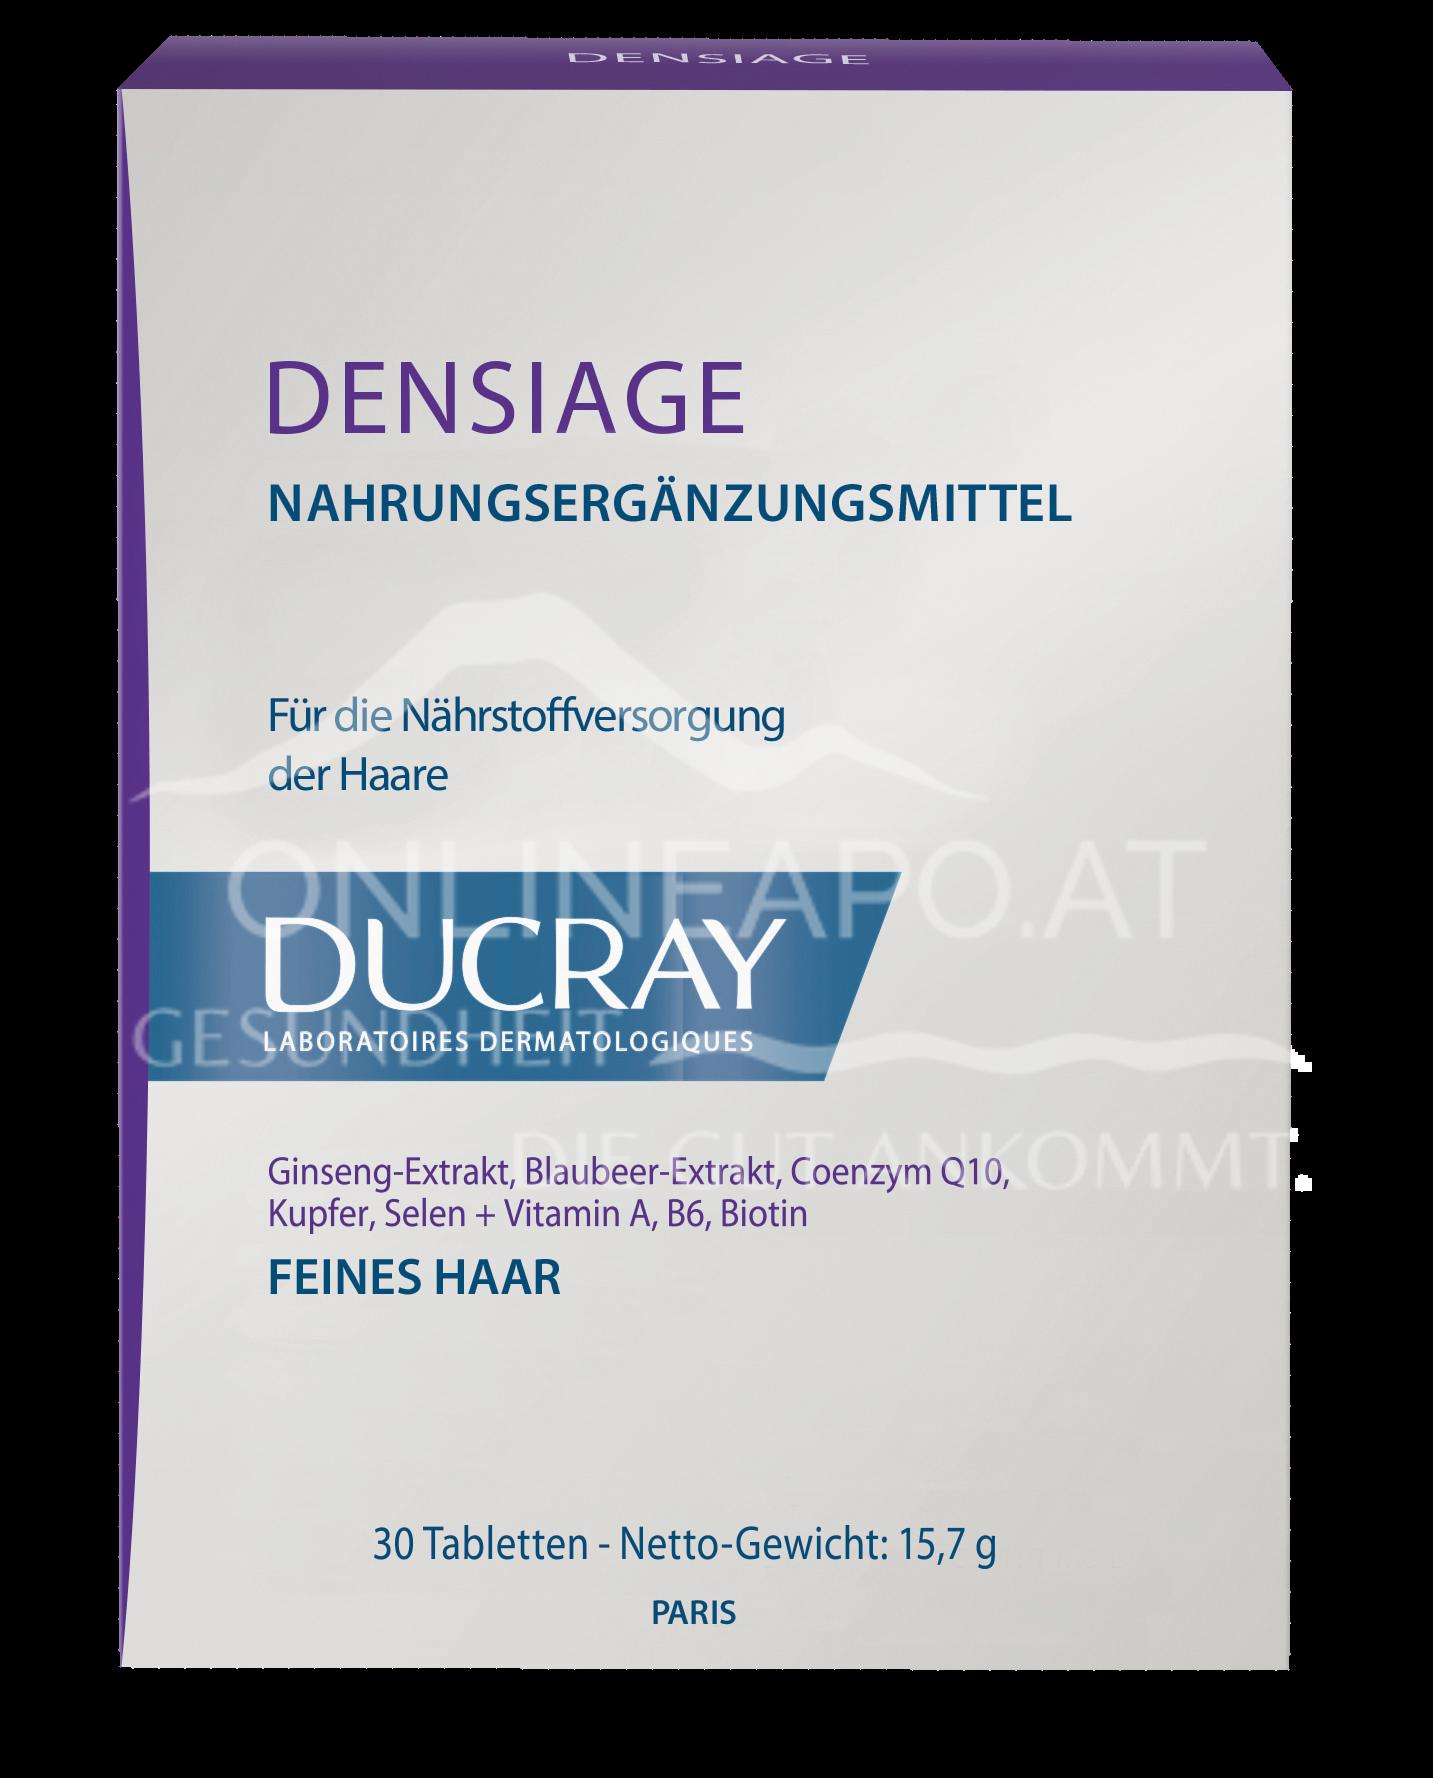 Ducray Densiage Nahrungsergänzungsmittel